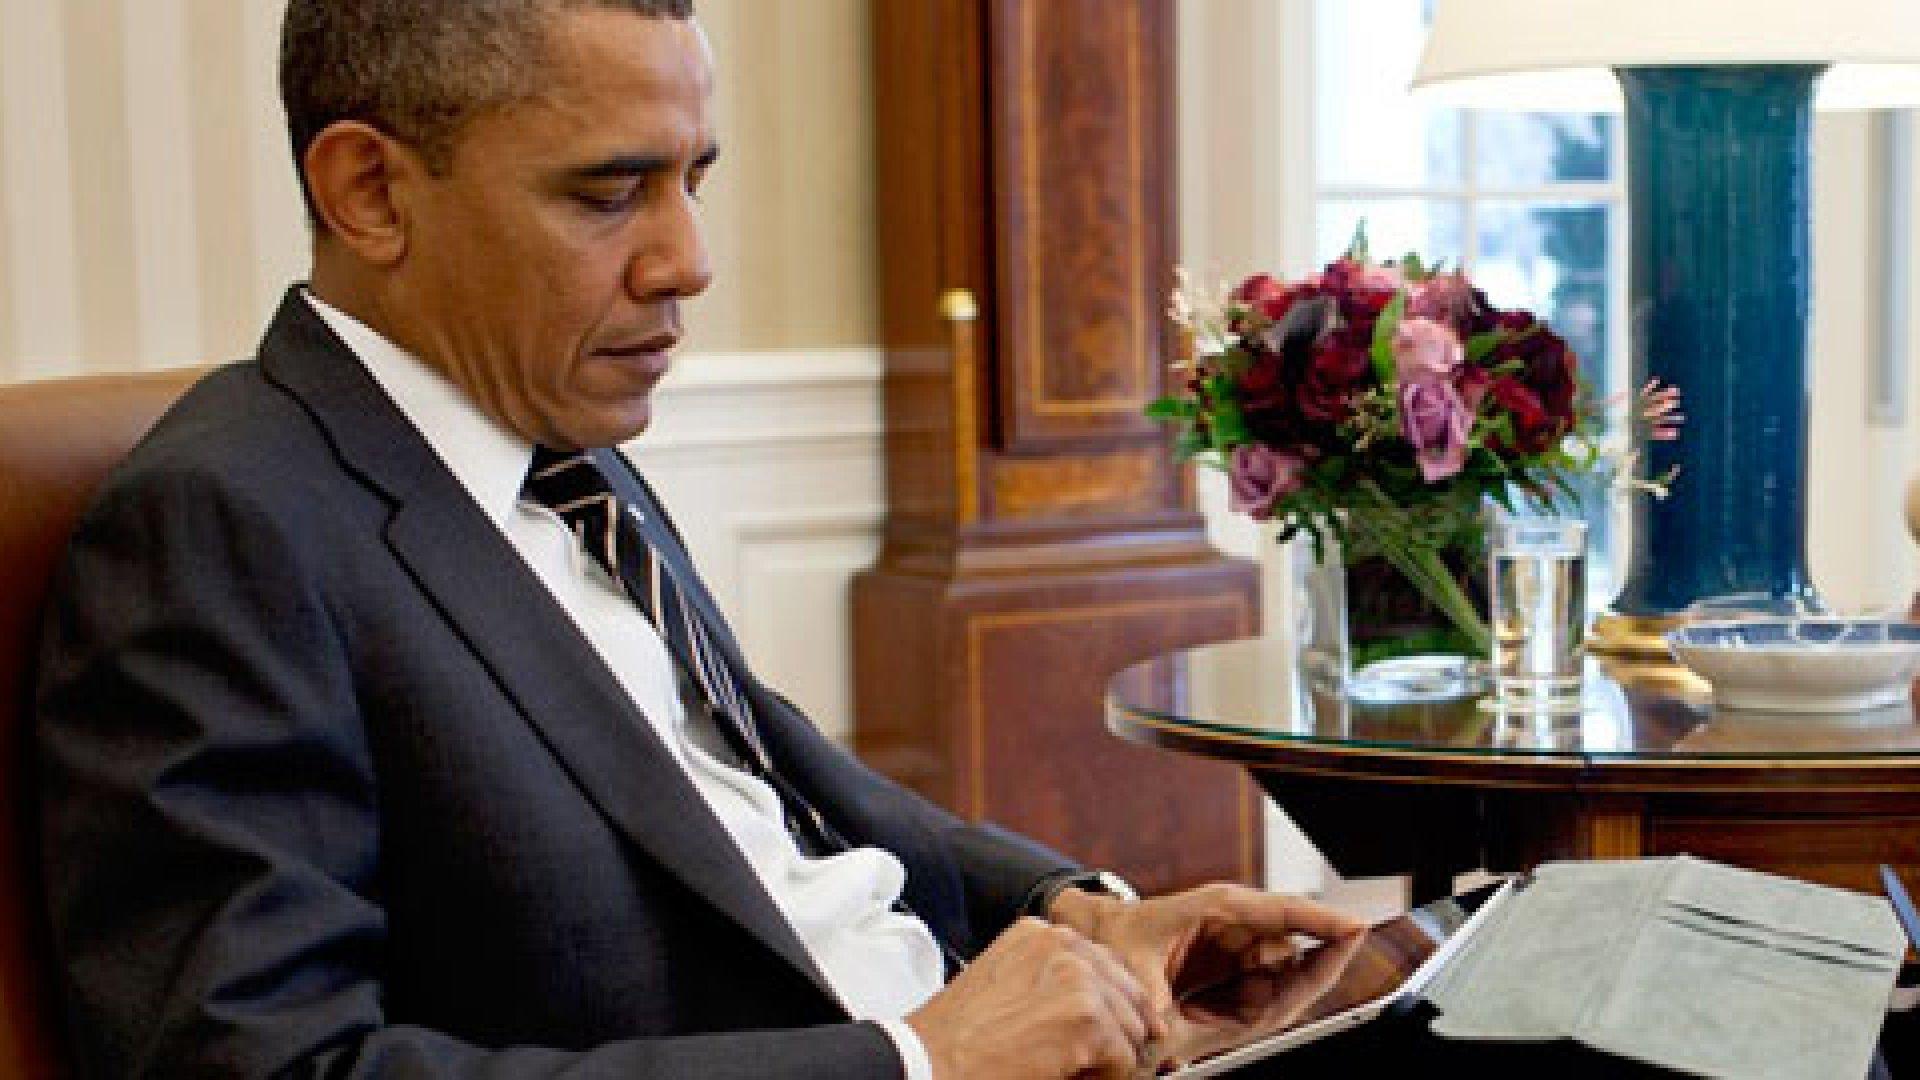 Learn From Obama's LinkedIn Profile